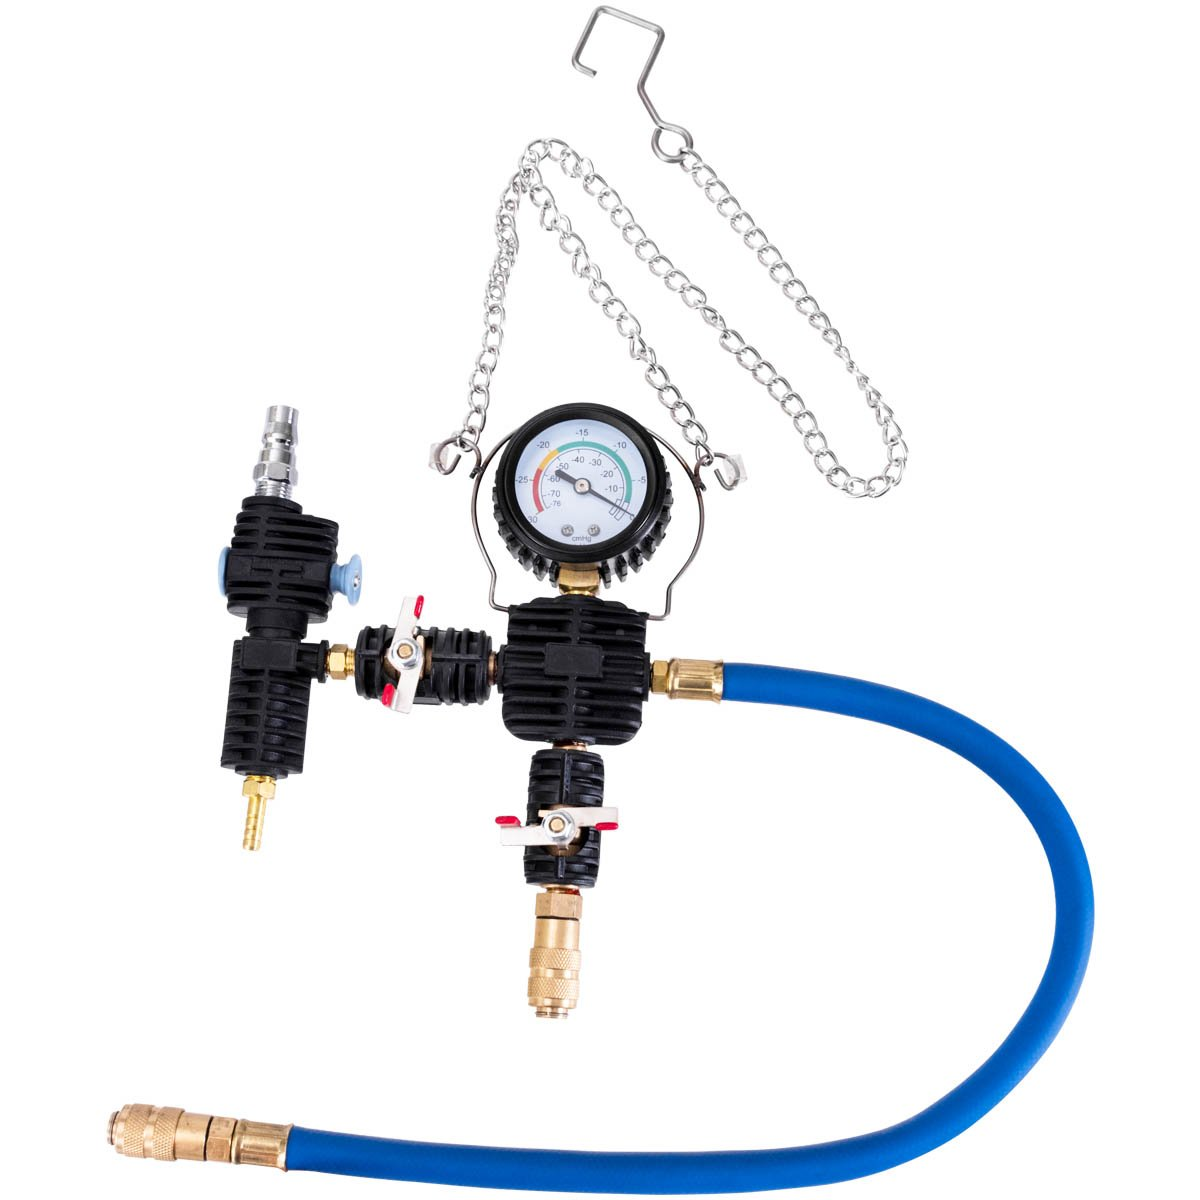 Goplus 28PCS Universal Radiator Pressure Tester Leak Checker Vacuum Type Cooling System Automotive Radiator Pressure Test Kit Purge and Refill Kit Set w/Carrying Case by Goplus (Image #7)